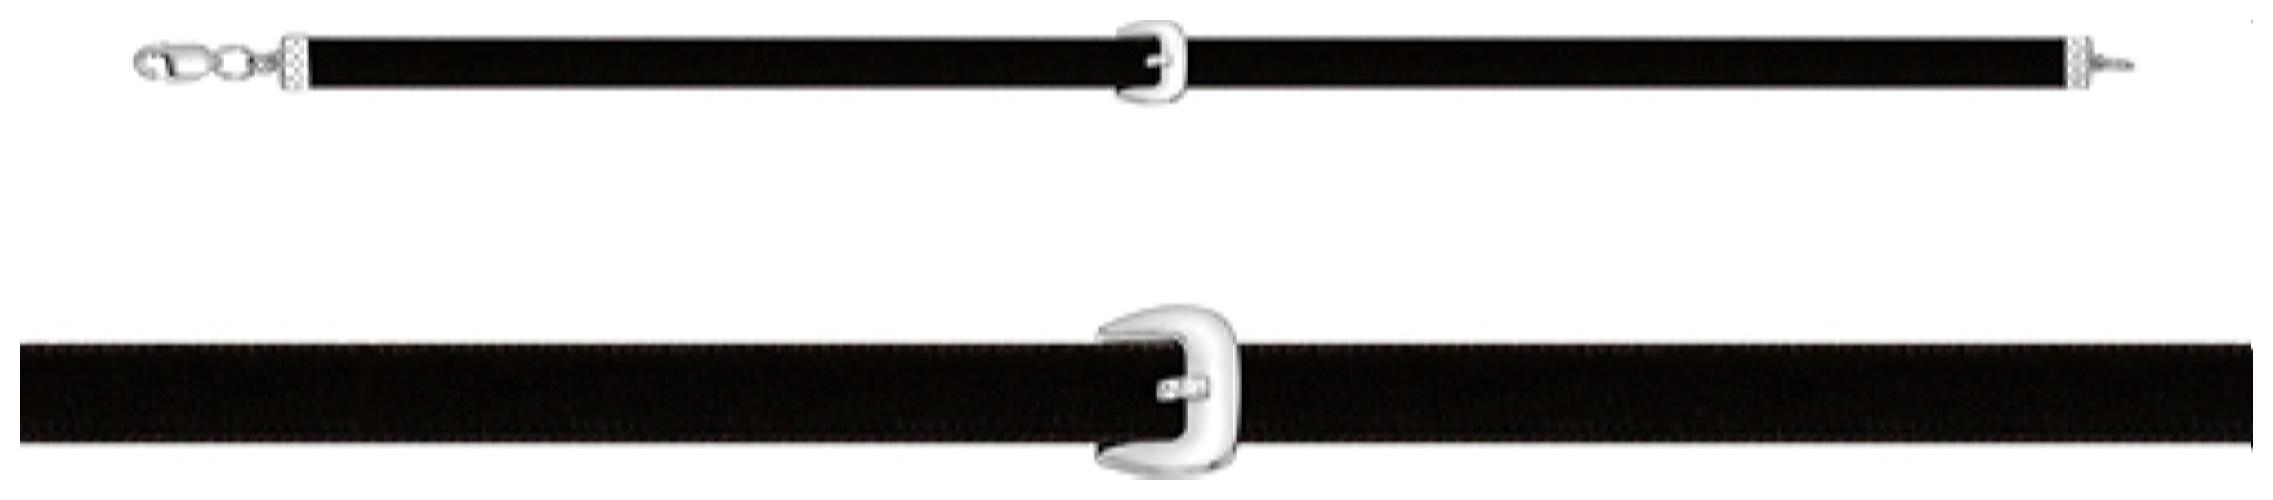 картинка колье из серебра 925° с070170